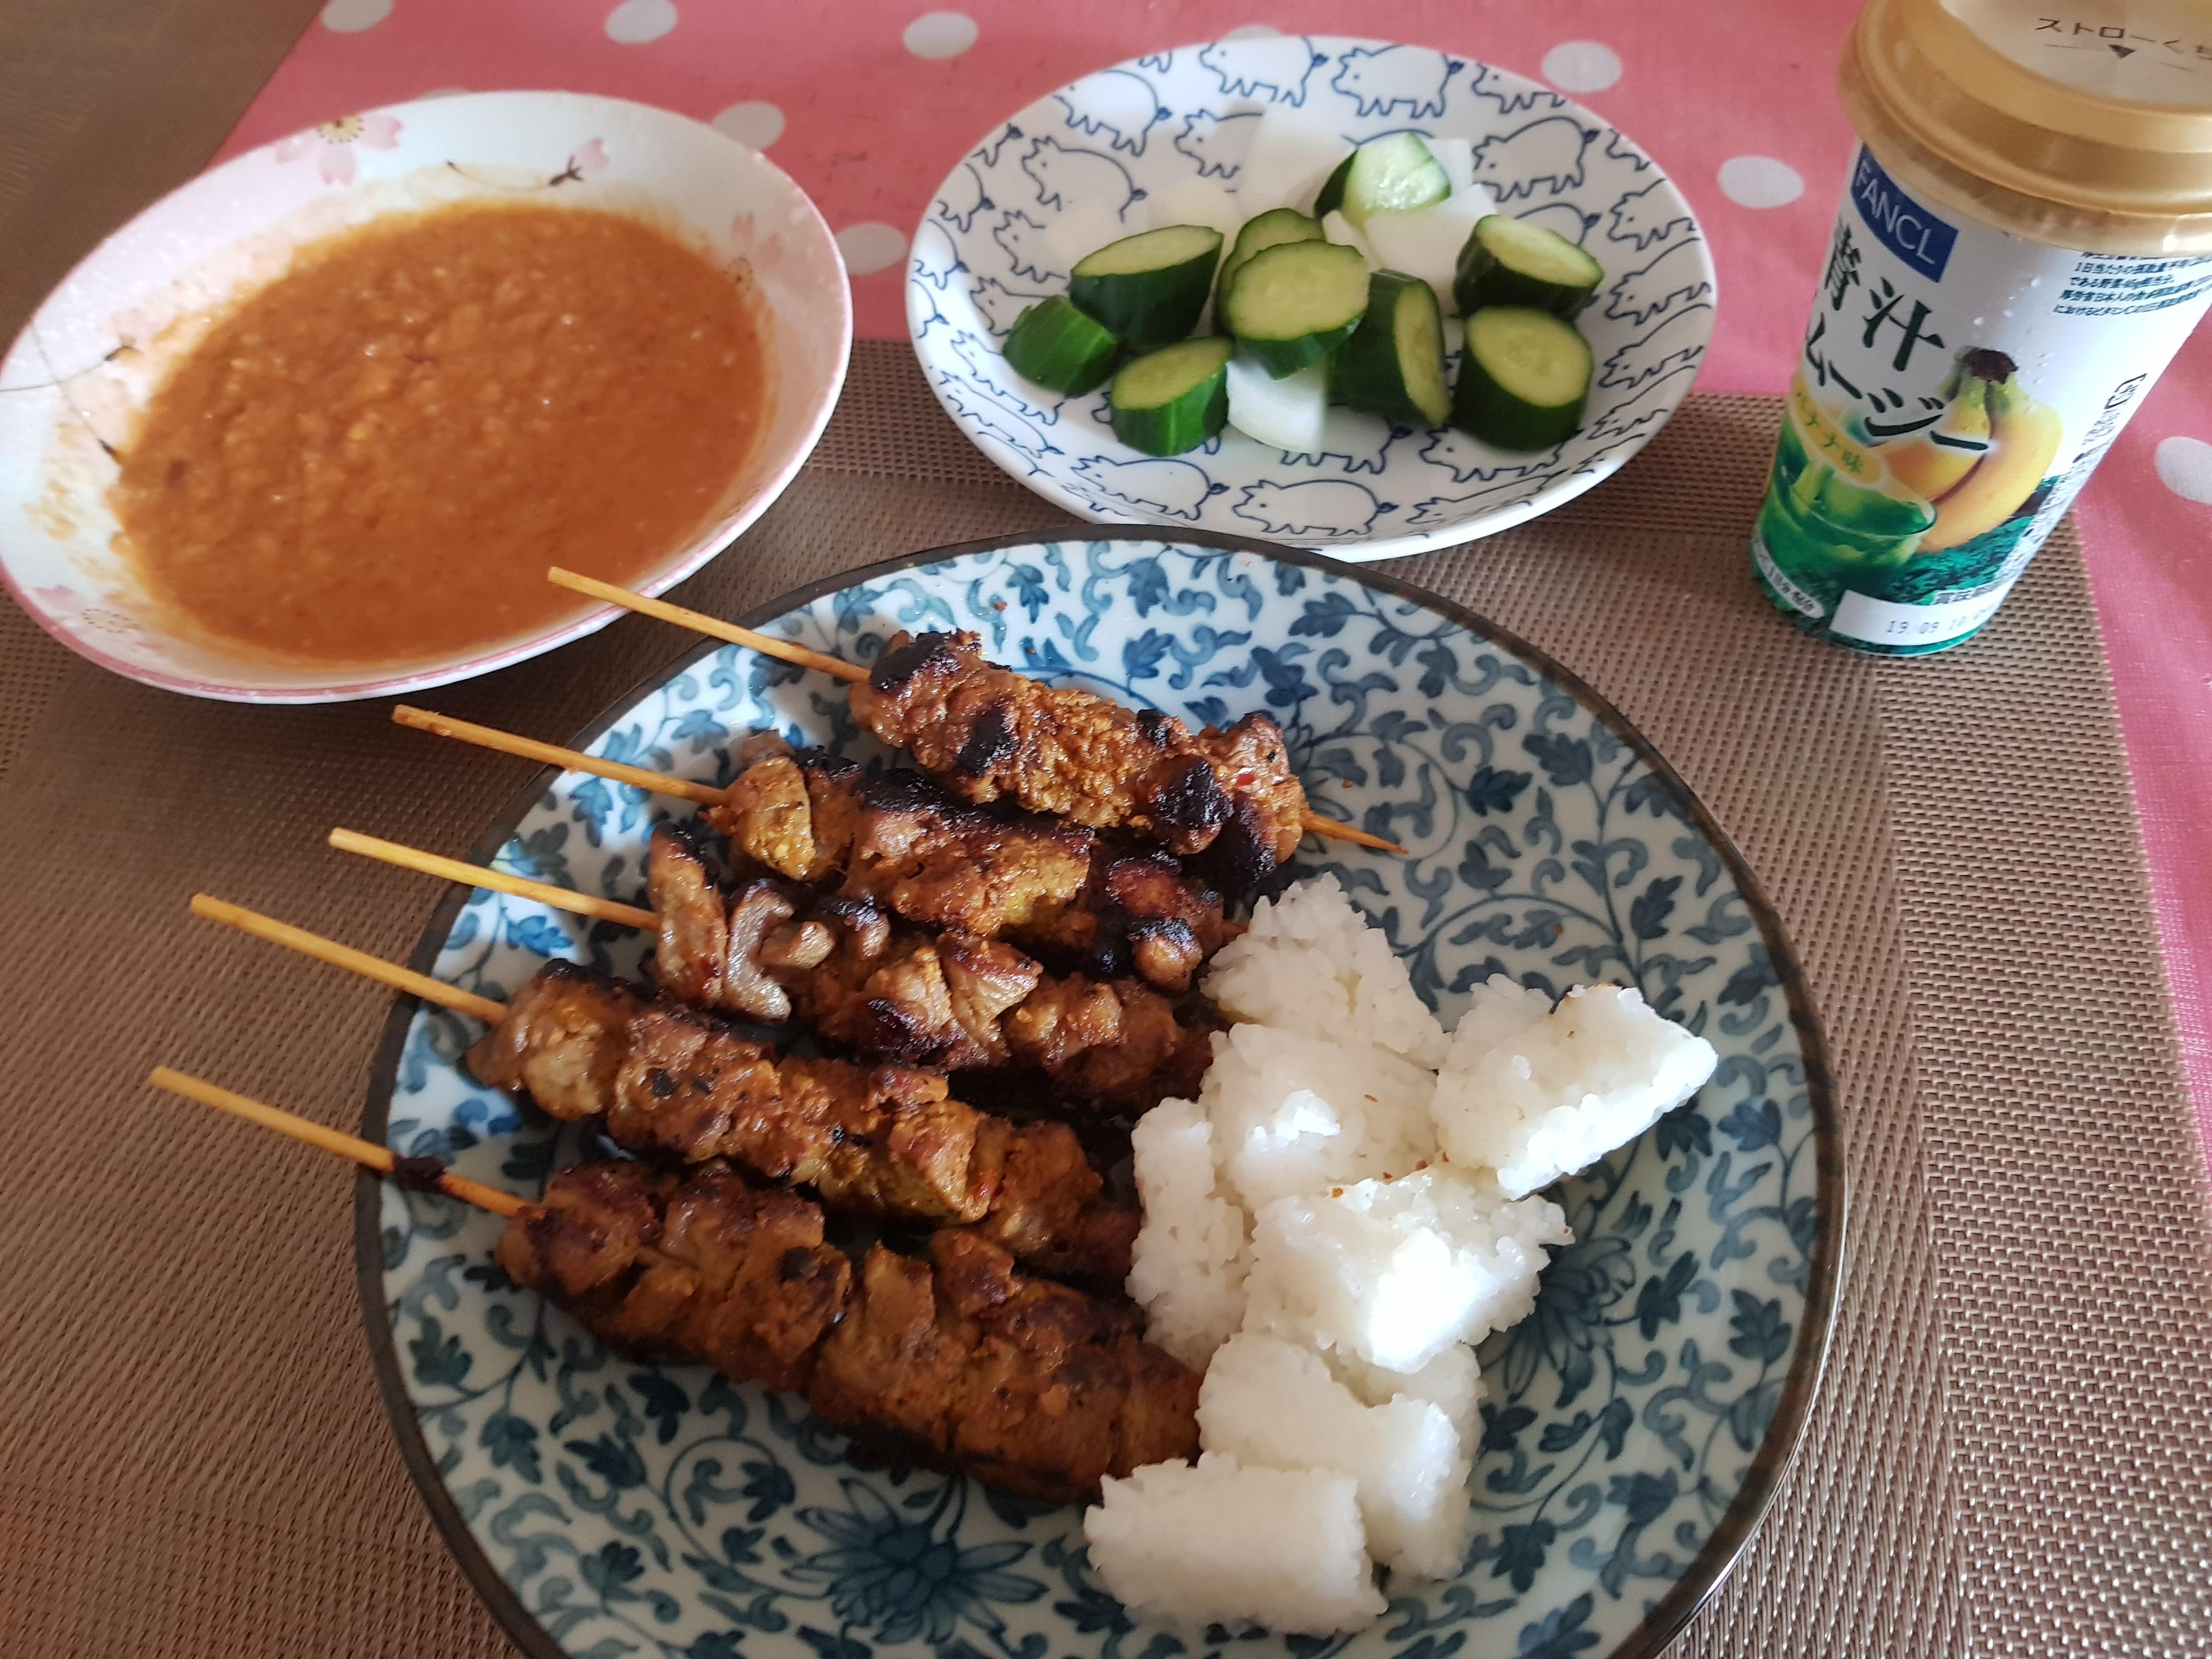 Penang Pork Satay